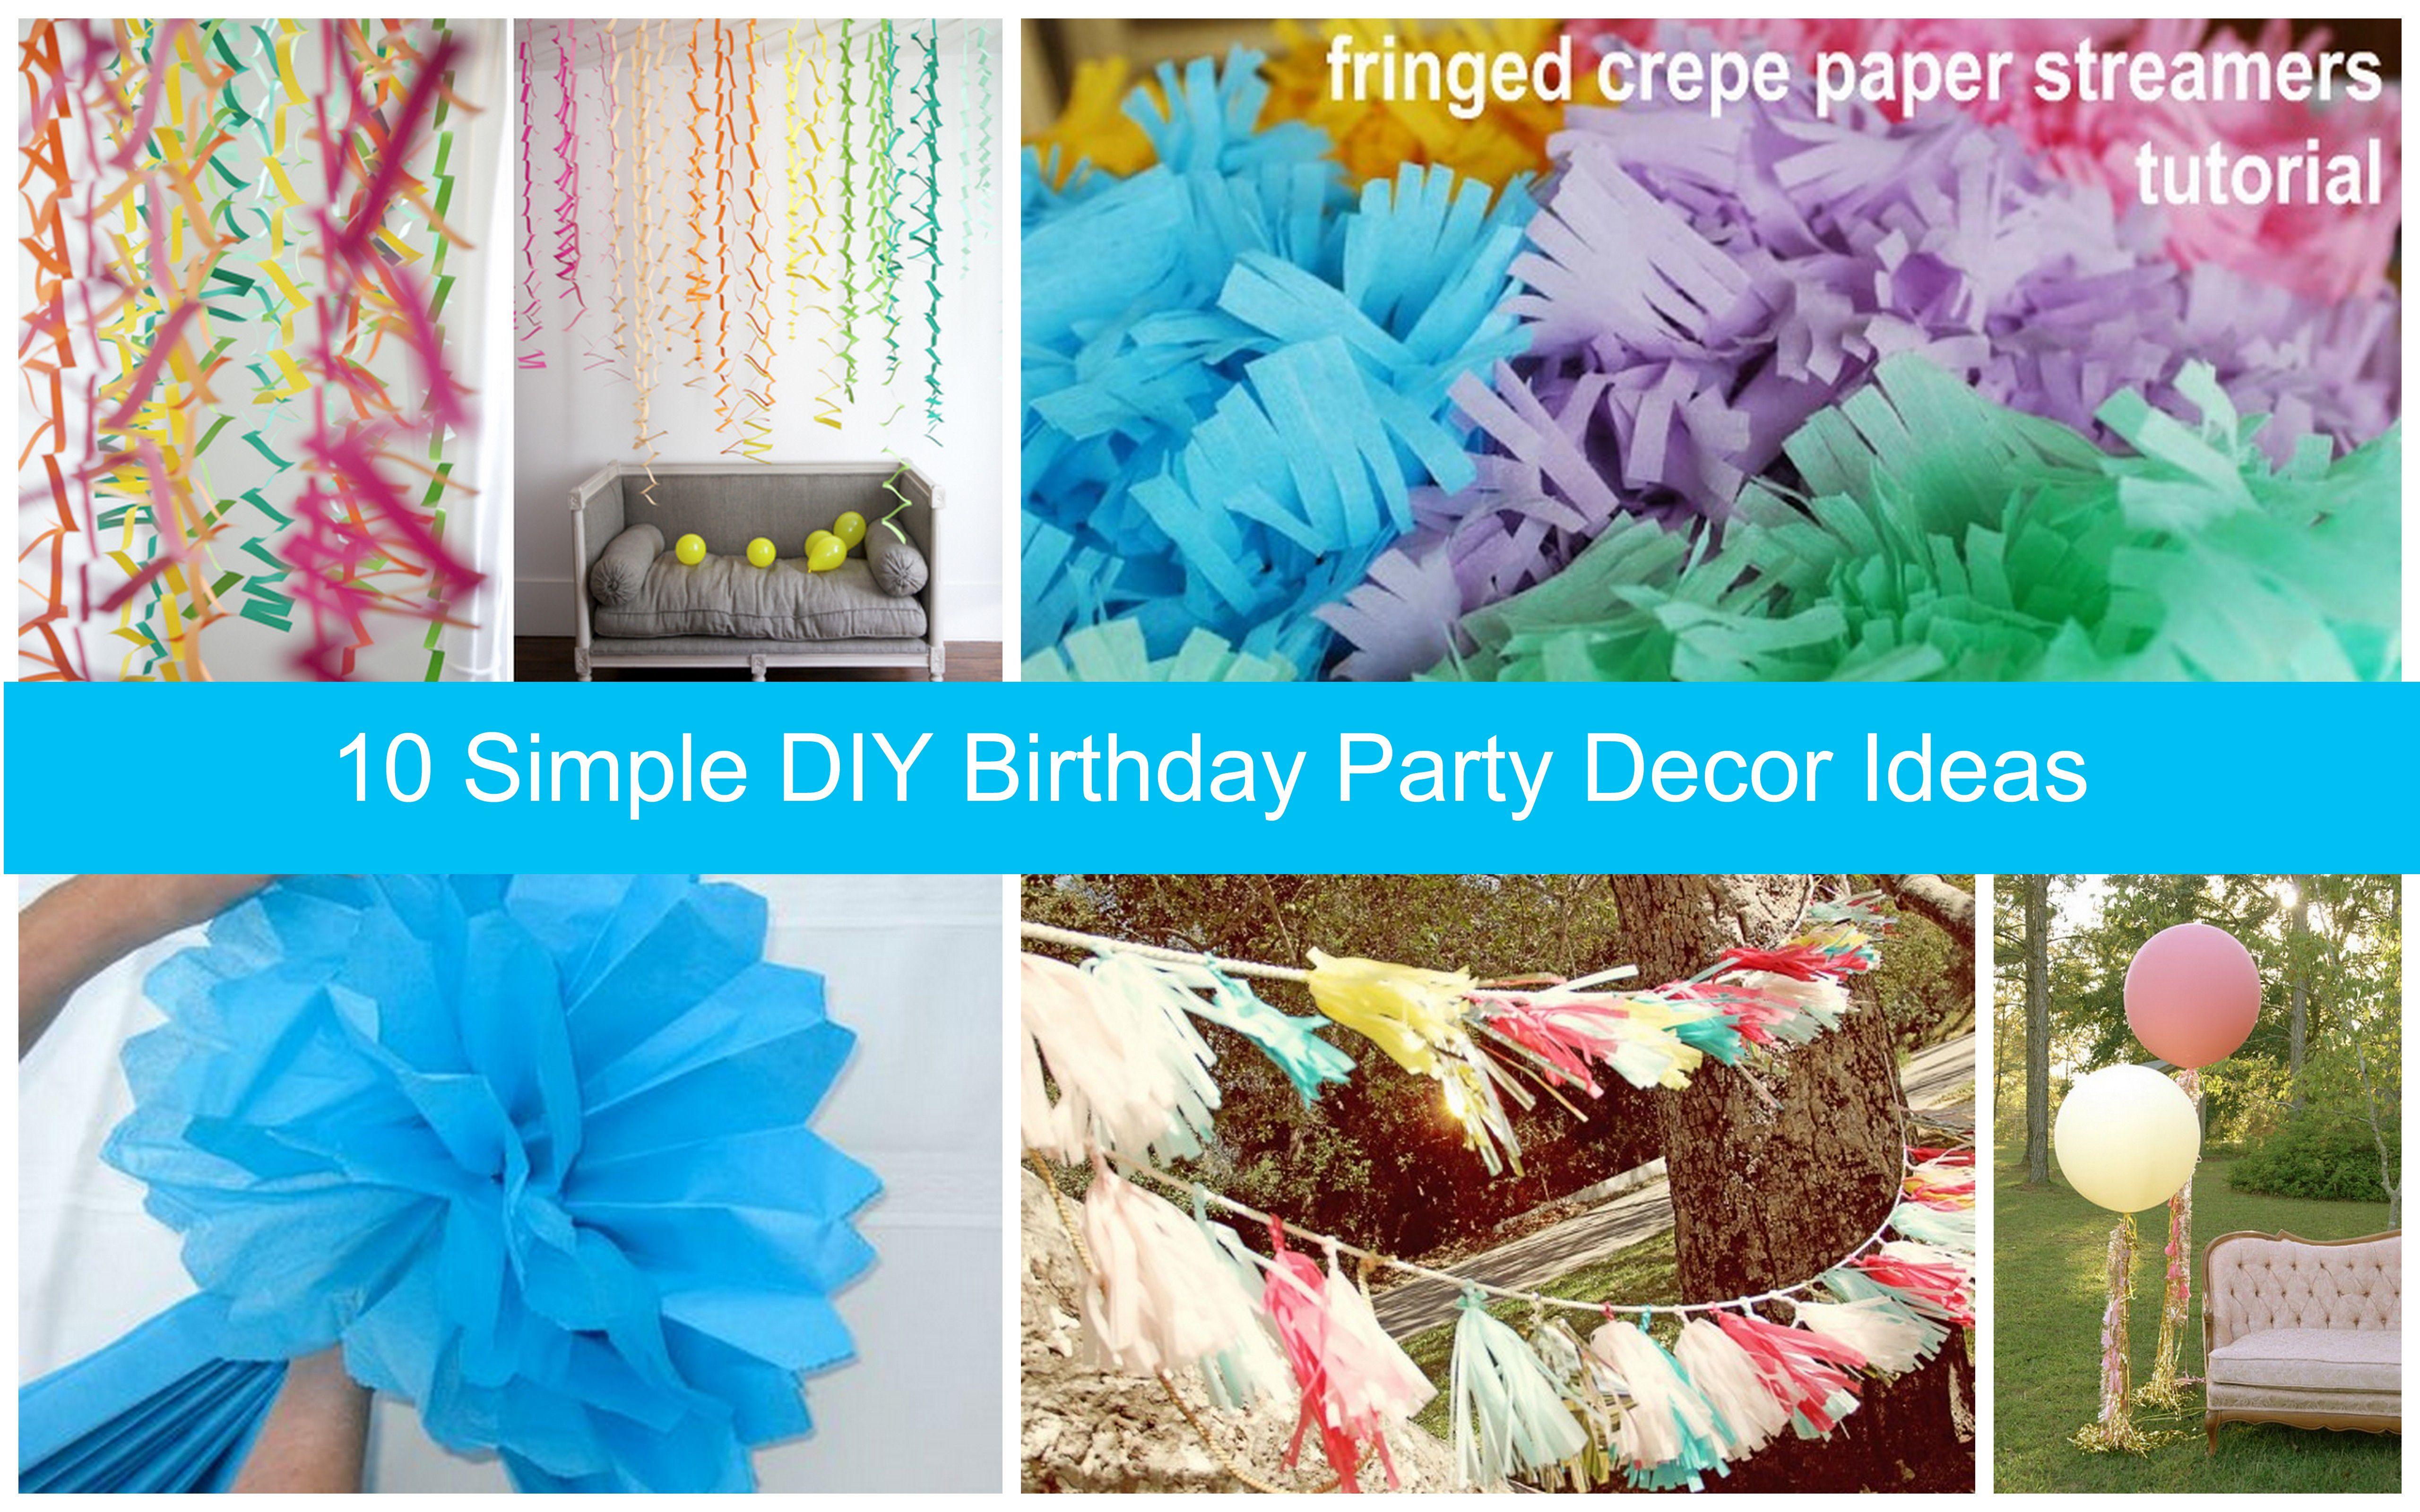 10 Simple Easy Diy Homemade Birthday Party Decorations Diy